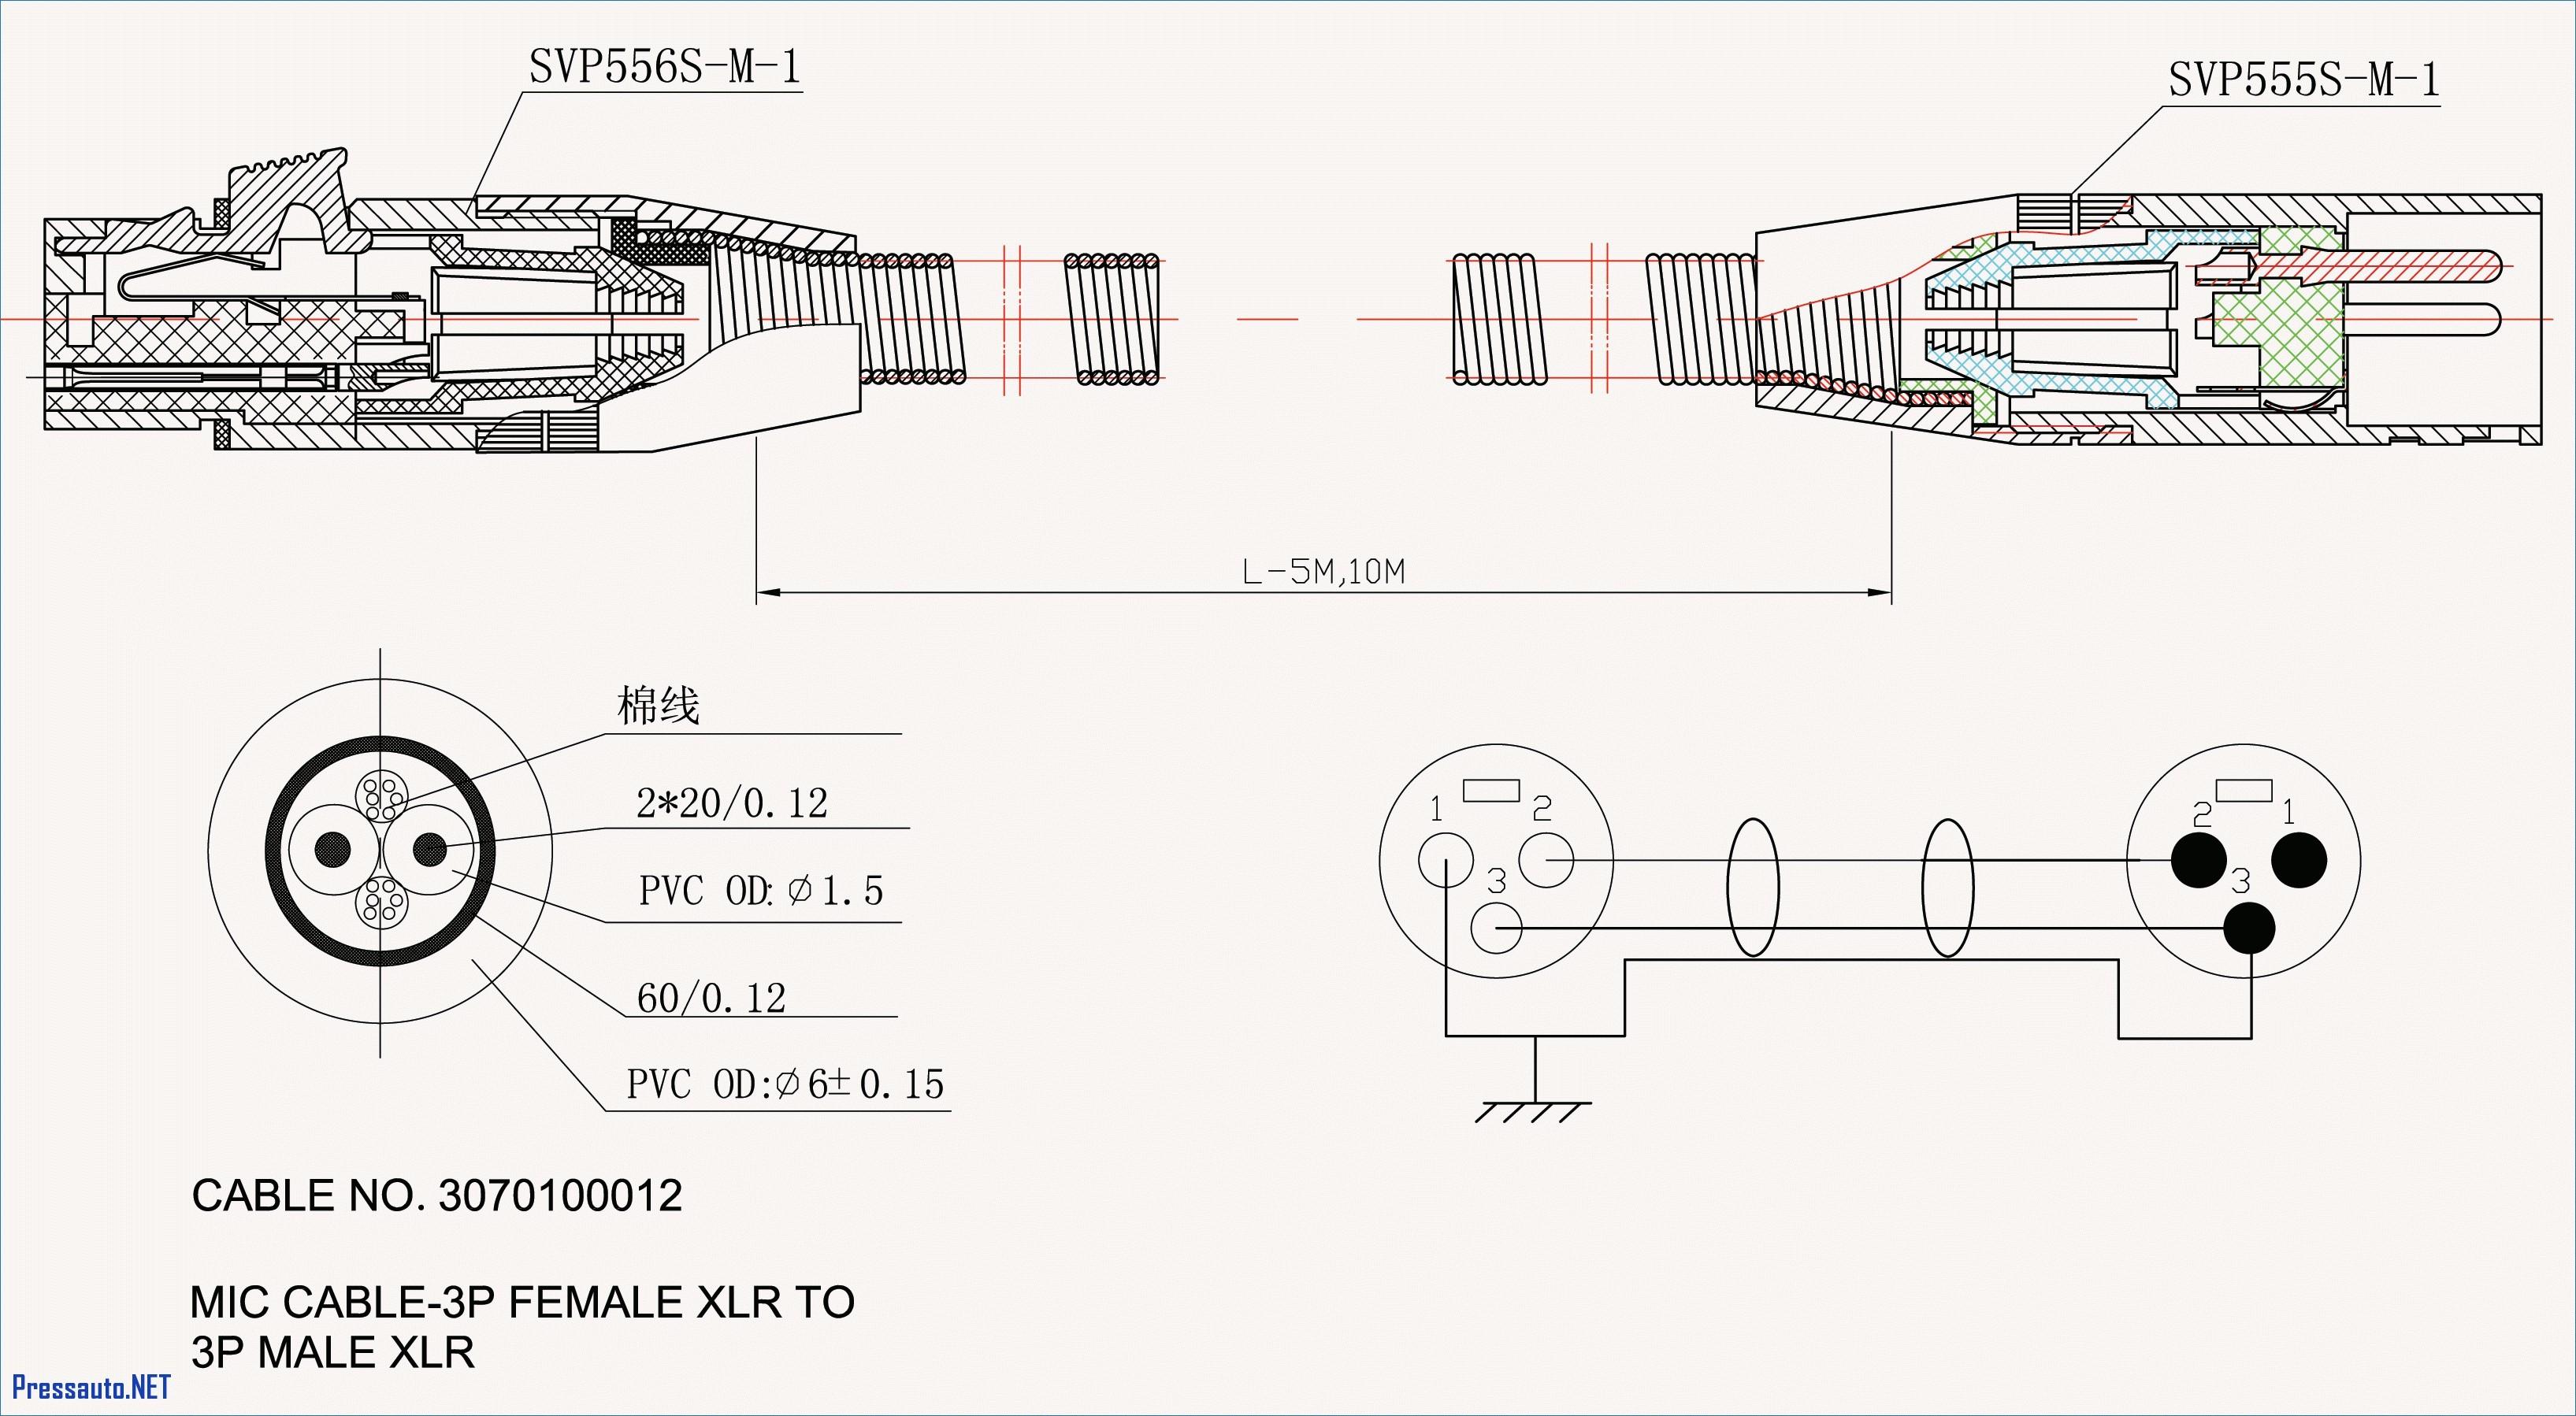 xlr connector wiring diagram wiring diagram image rh mainetreasurechest com Solder XLR Connector Wiring Diagram XLR Cable Diagram